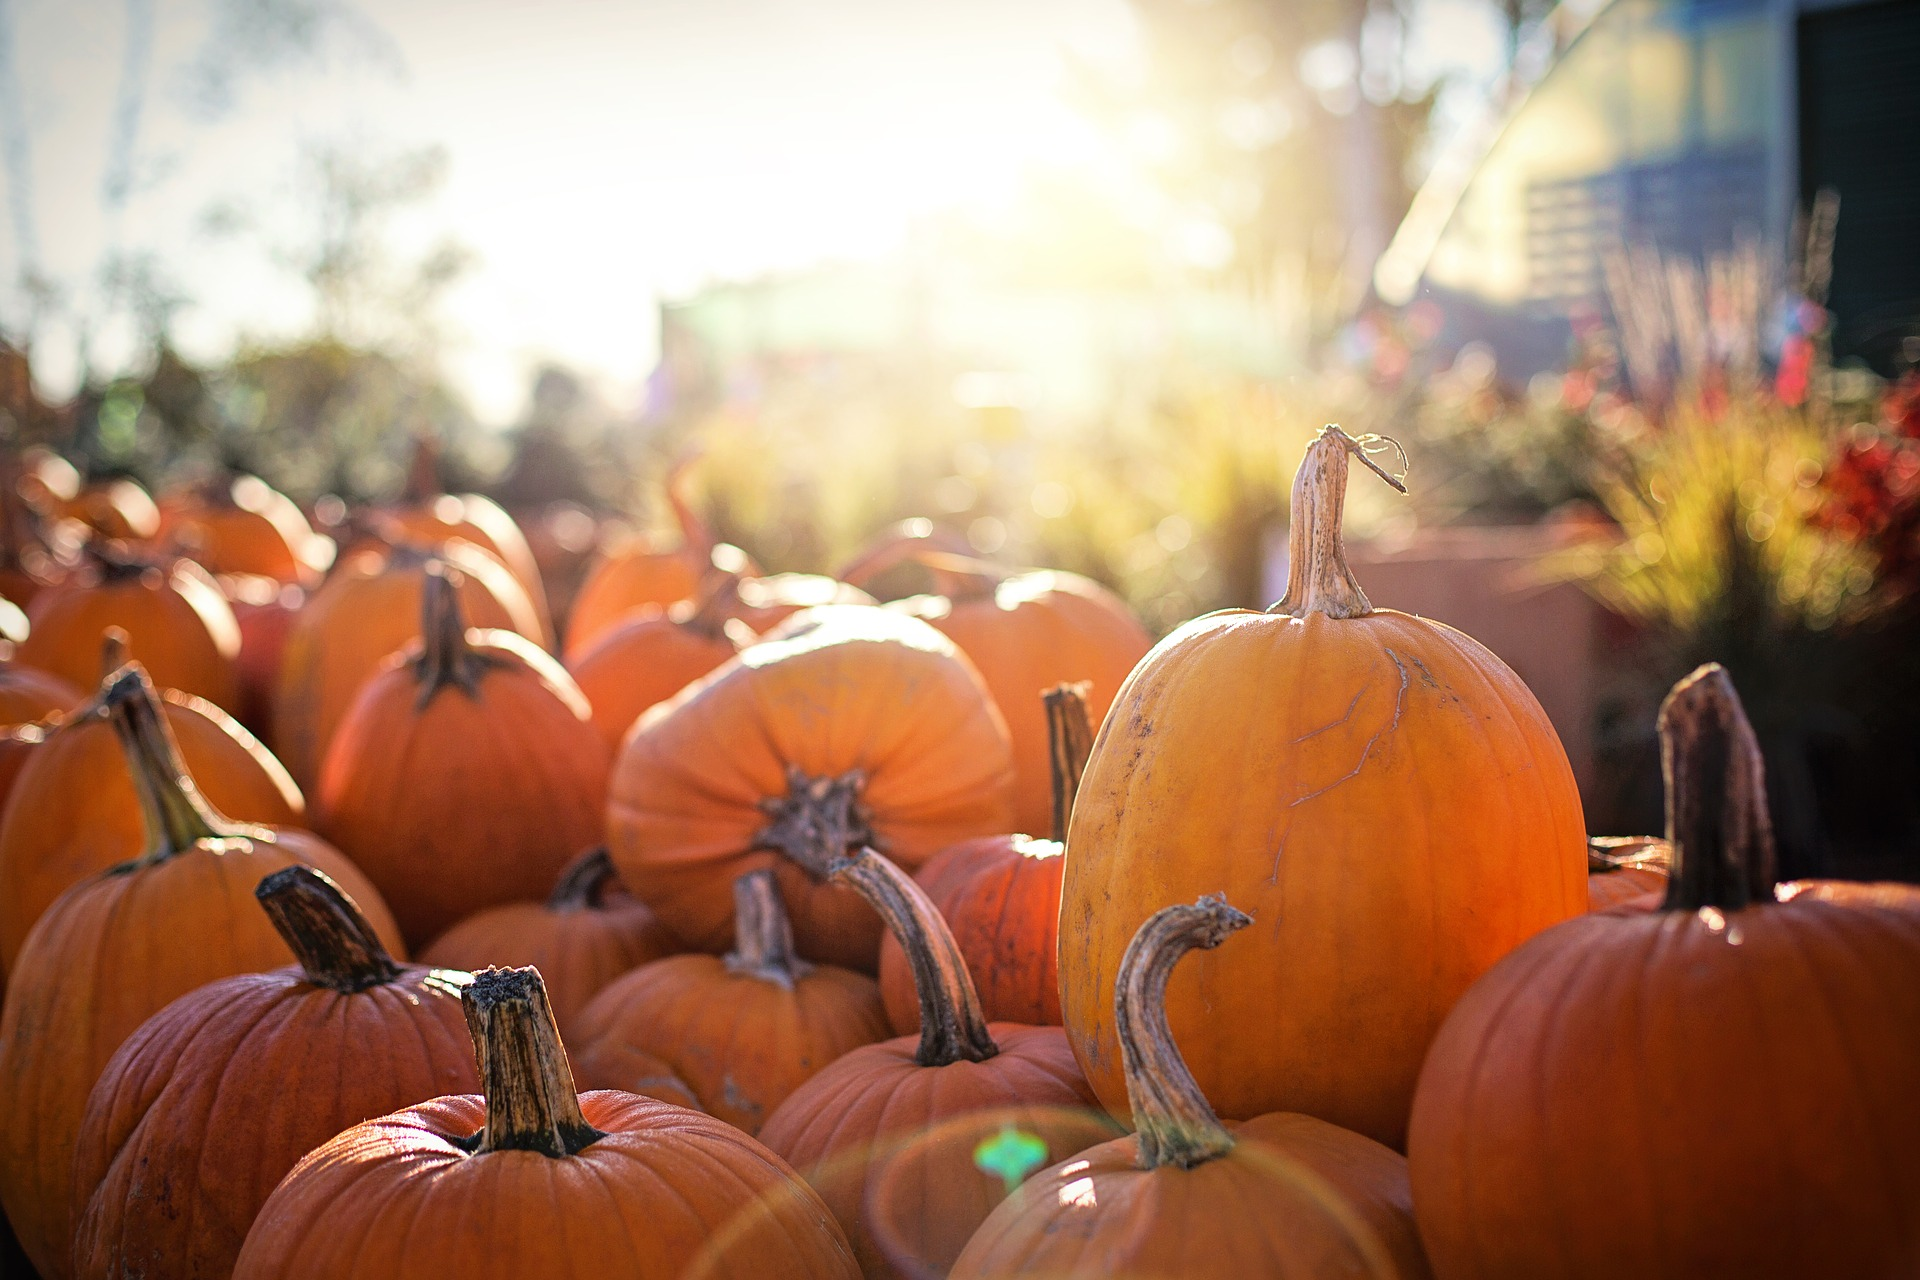 Photo of Pumpkins at Golden Hour